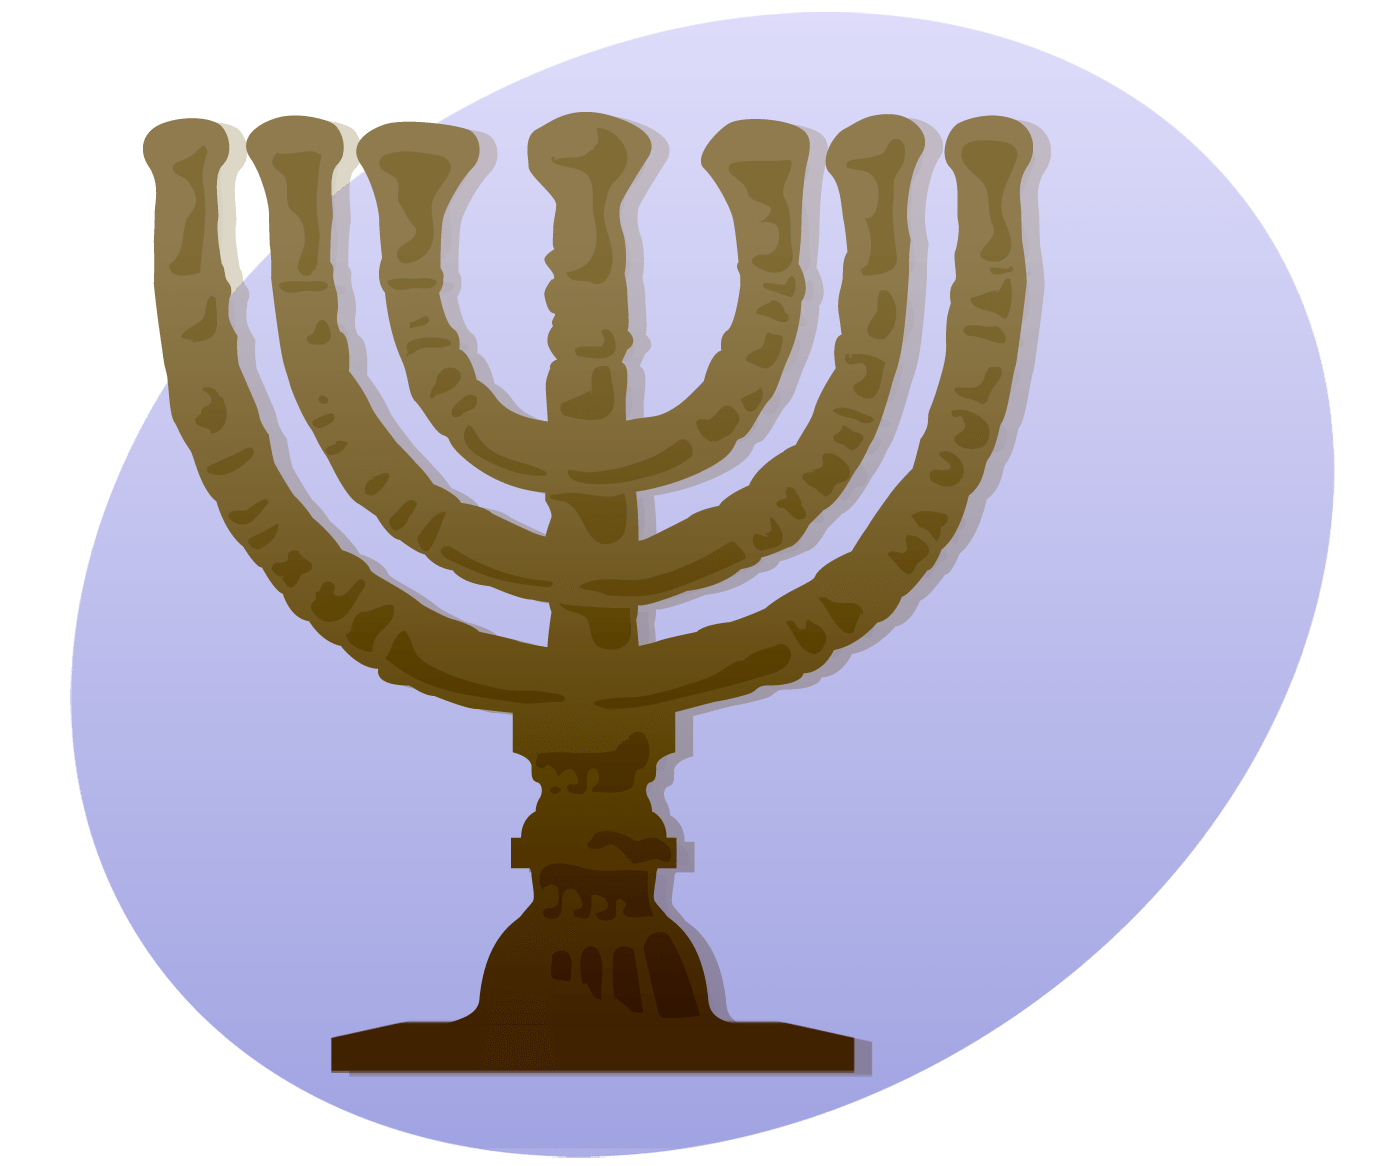 Transparent png images stickpng. Hanukkah clipart judaism